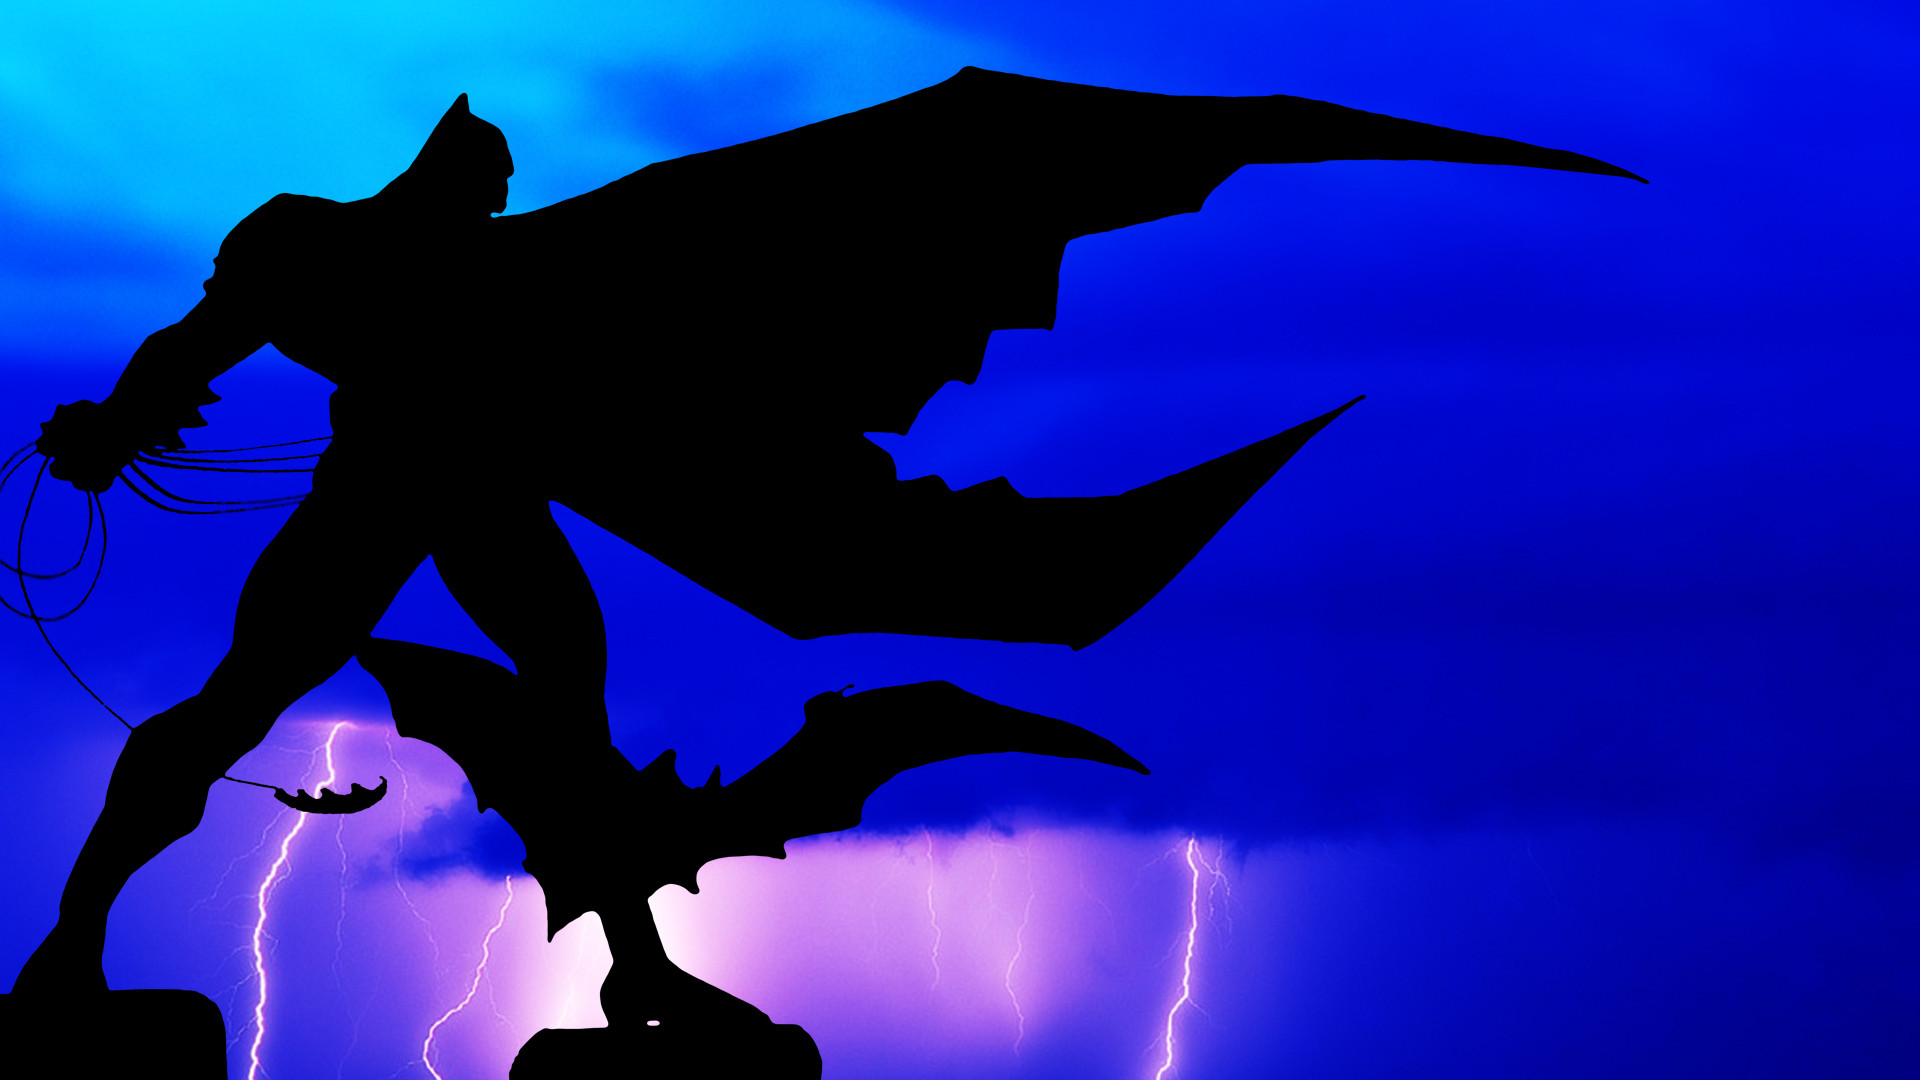 The Dark Knight Returns Wallpaper